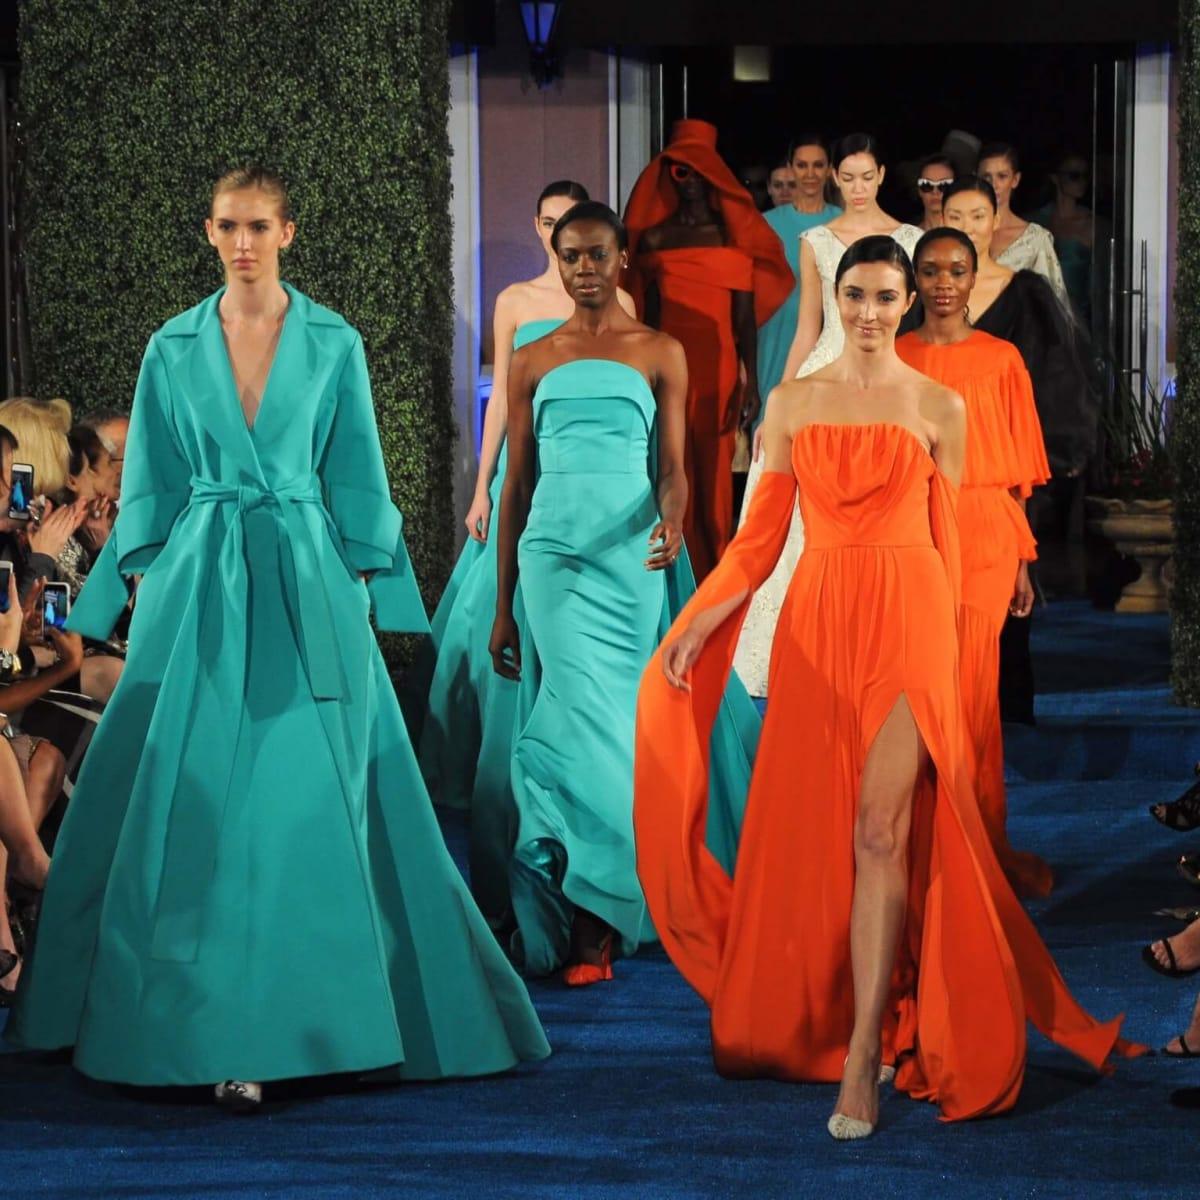 Christian Siriano runway show at Elizabeth Anthony